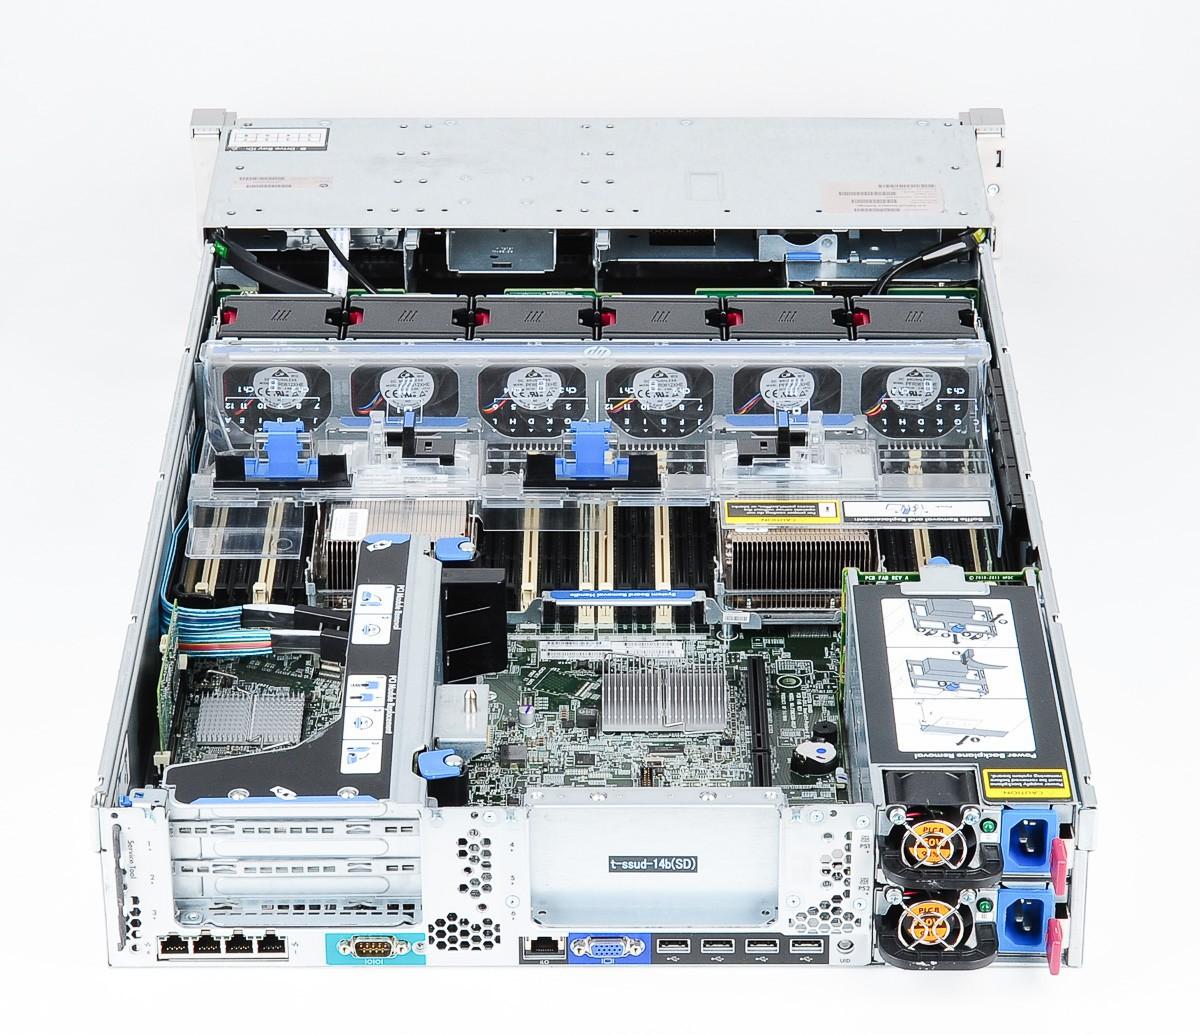 HP DL360p G8 Xeon E5-2630 v2 32GB 10600R RAM No-HDD 2x-460wPSU